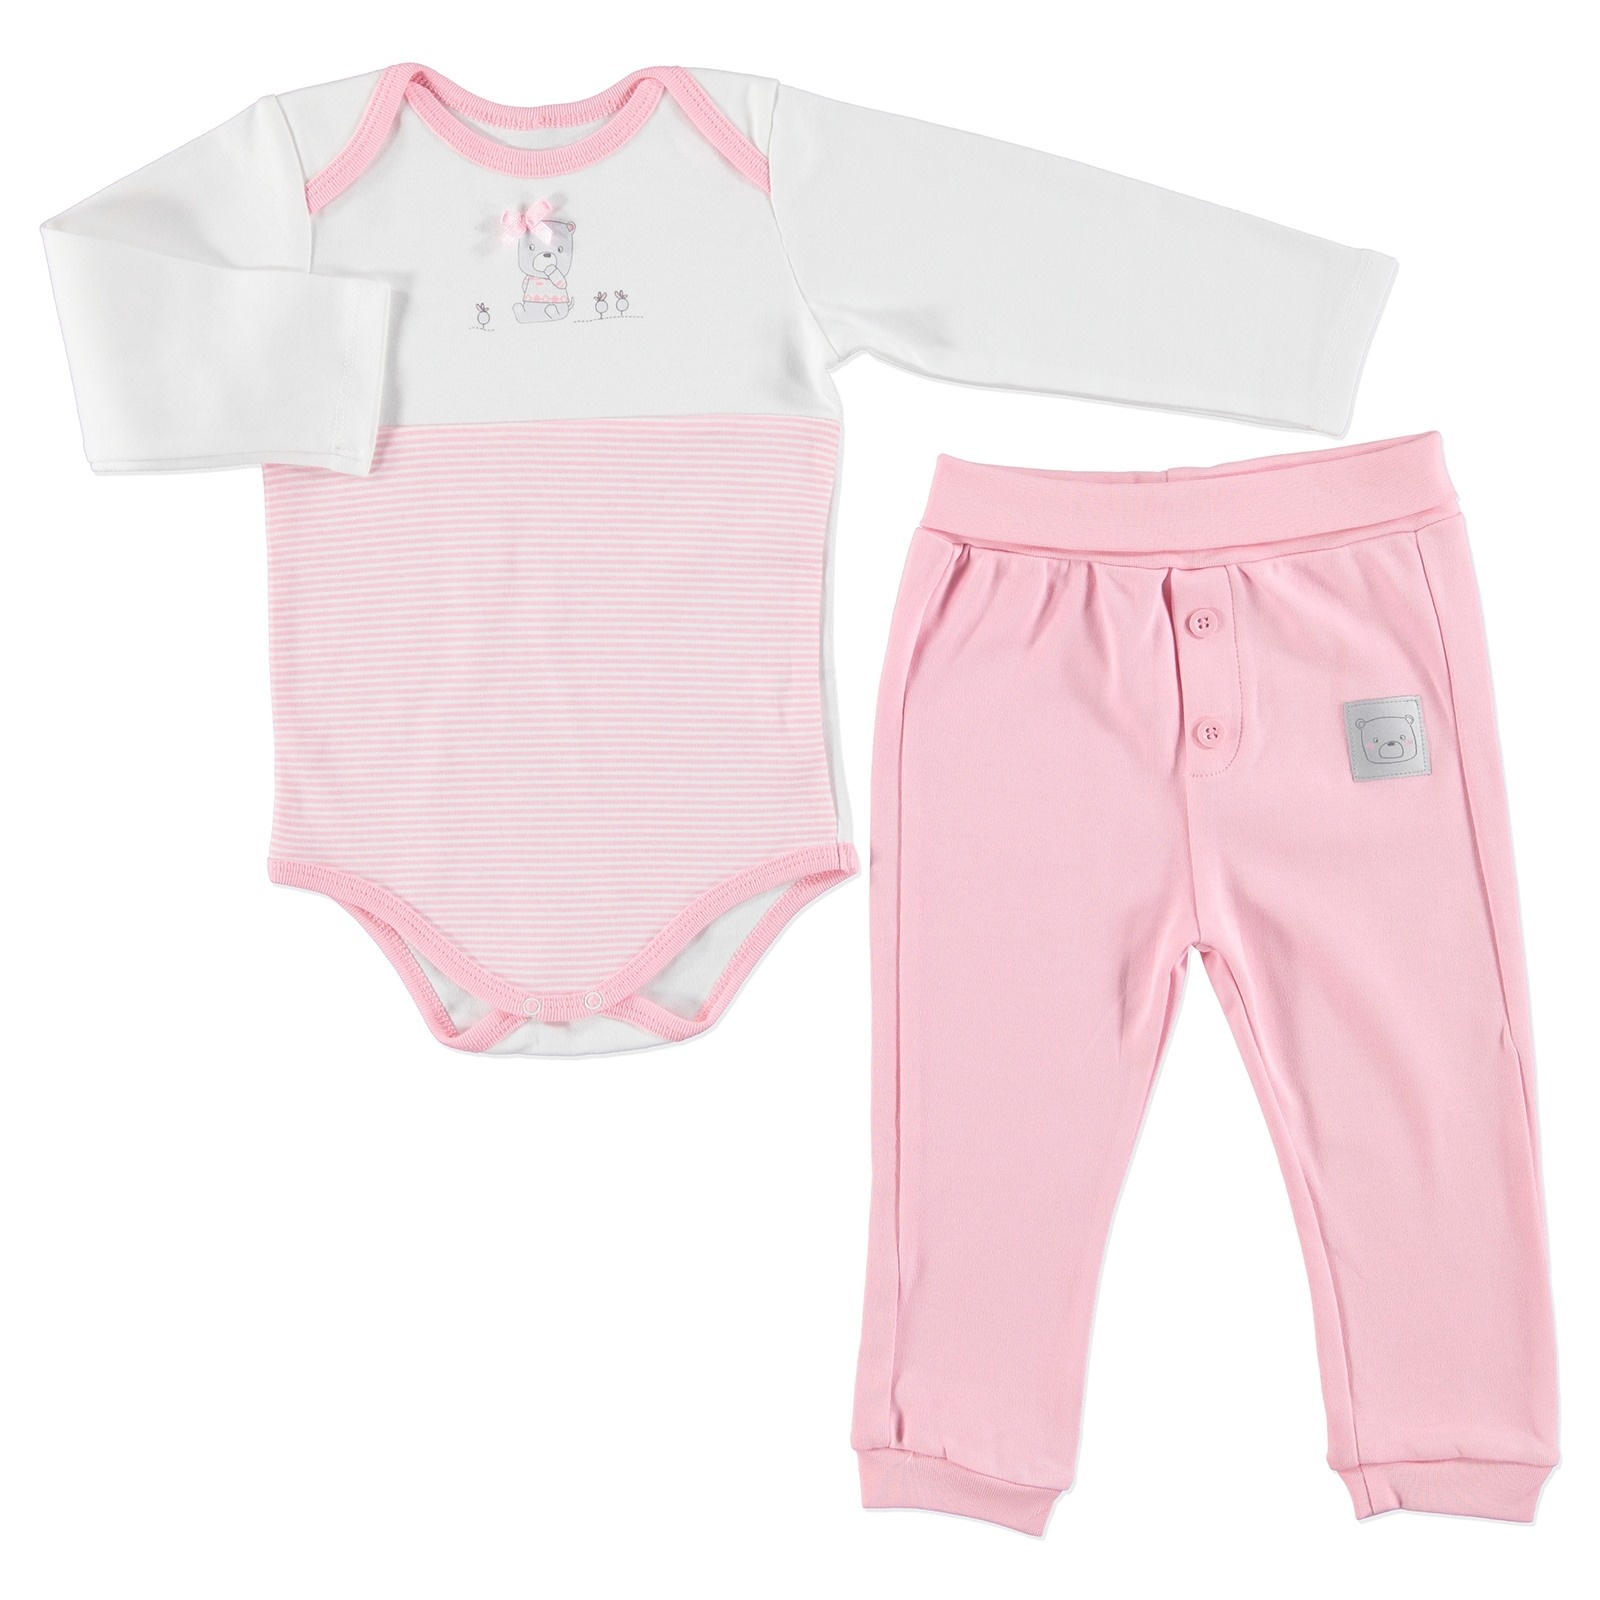 Ebebek Bambaki Cloud Baby Girl Collar Bodysuit Footless Trousers 2 Pcs Set